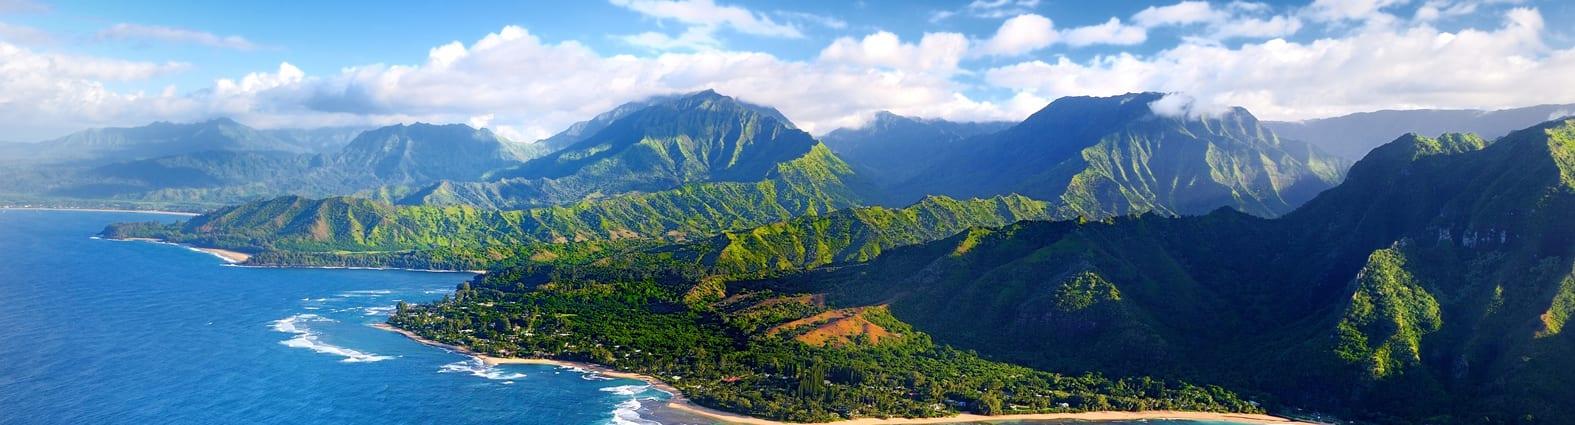 Air Tours Maui, Maui Air Tours Hawaii